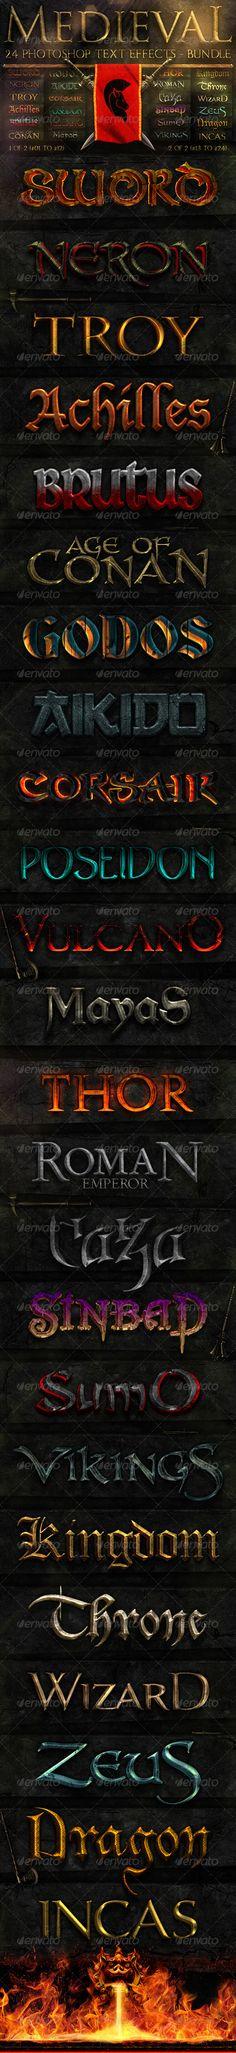 Medieval Photoshop Text Effects [BUNDLE]